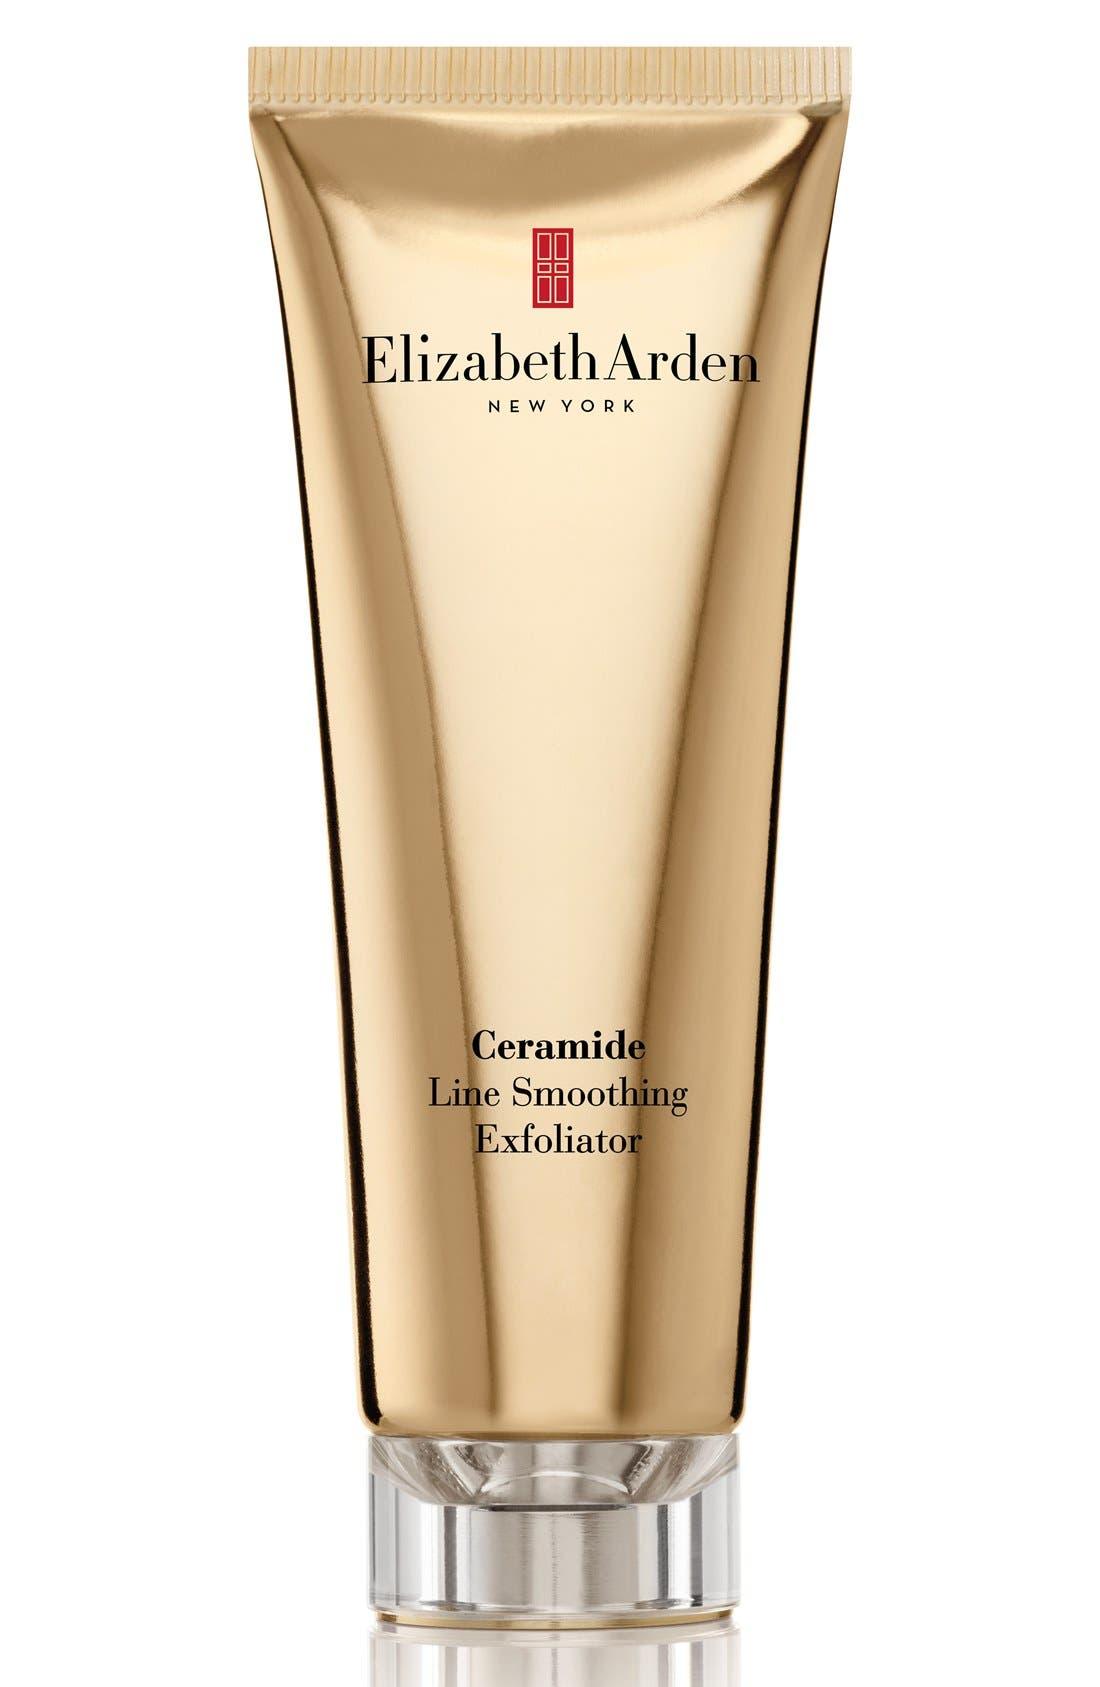 ELIZABETH ARDEN,                             Ceramide 'Plump Perfect' Gentle Line Smoothing Exfoliator,                             Main thumbnail 1, color,                             000